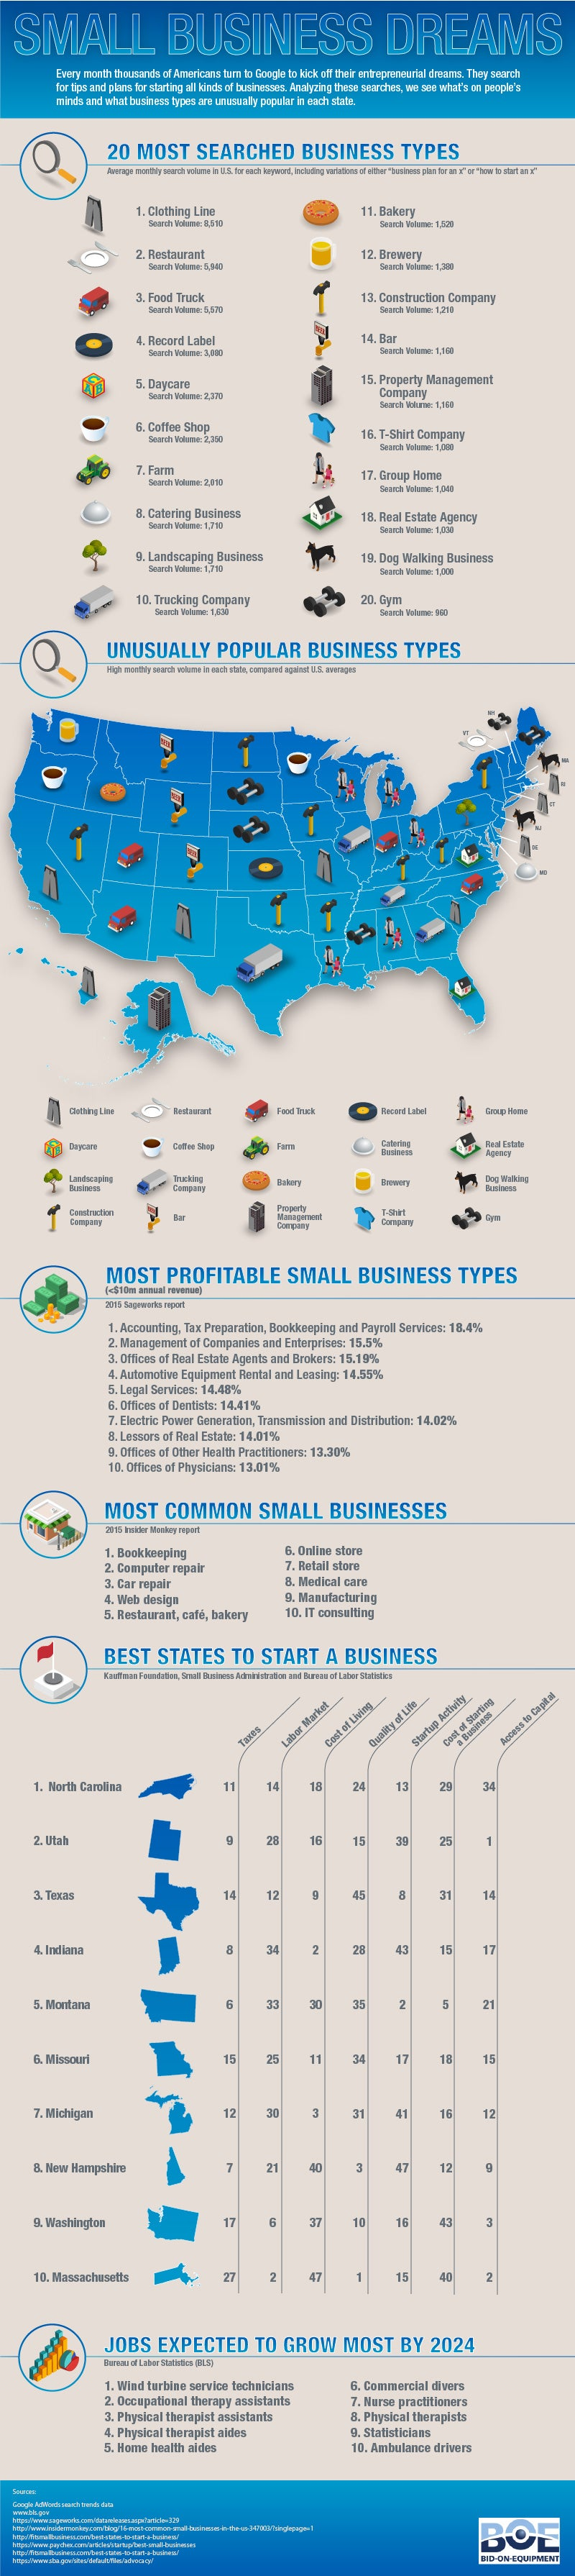 https://assets.entrepreneur.com/images/misc/1507142265_small-business-dreams.jpg